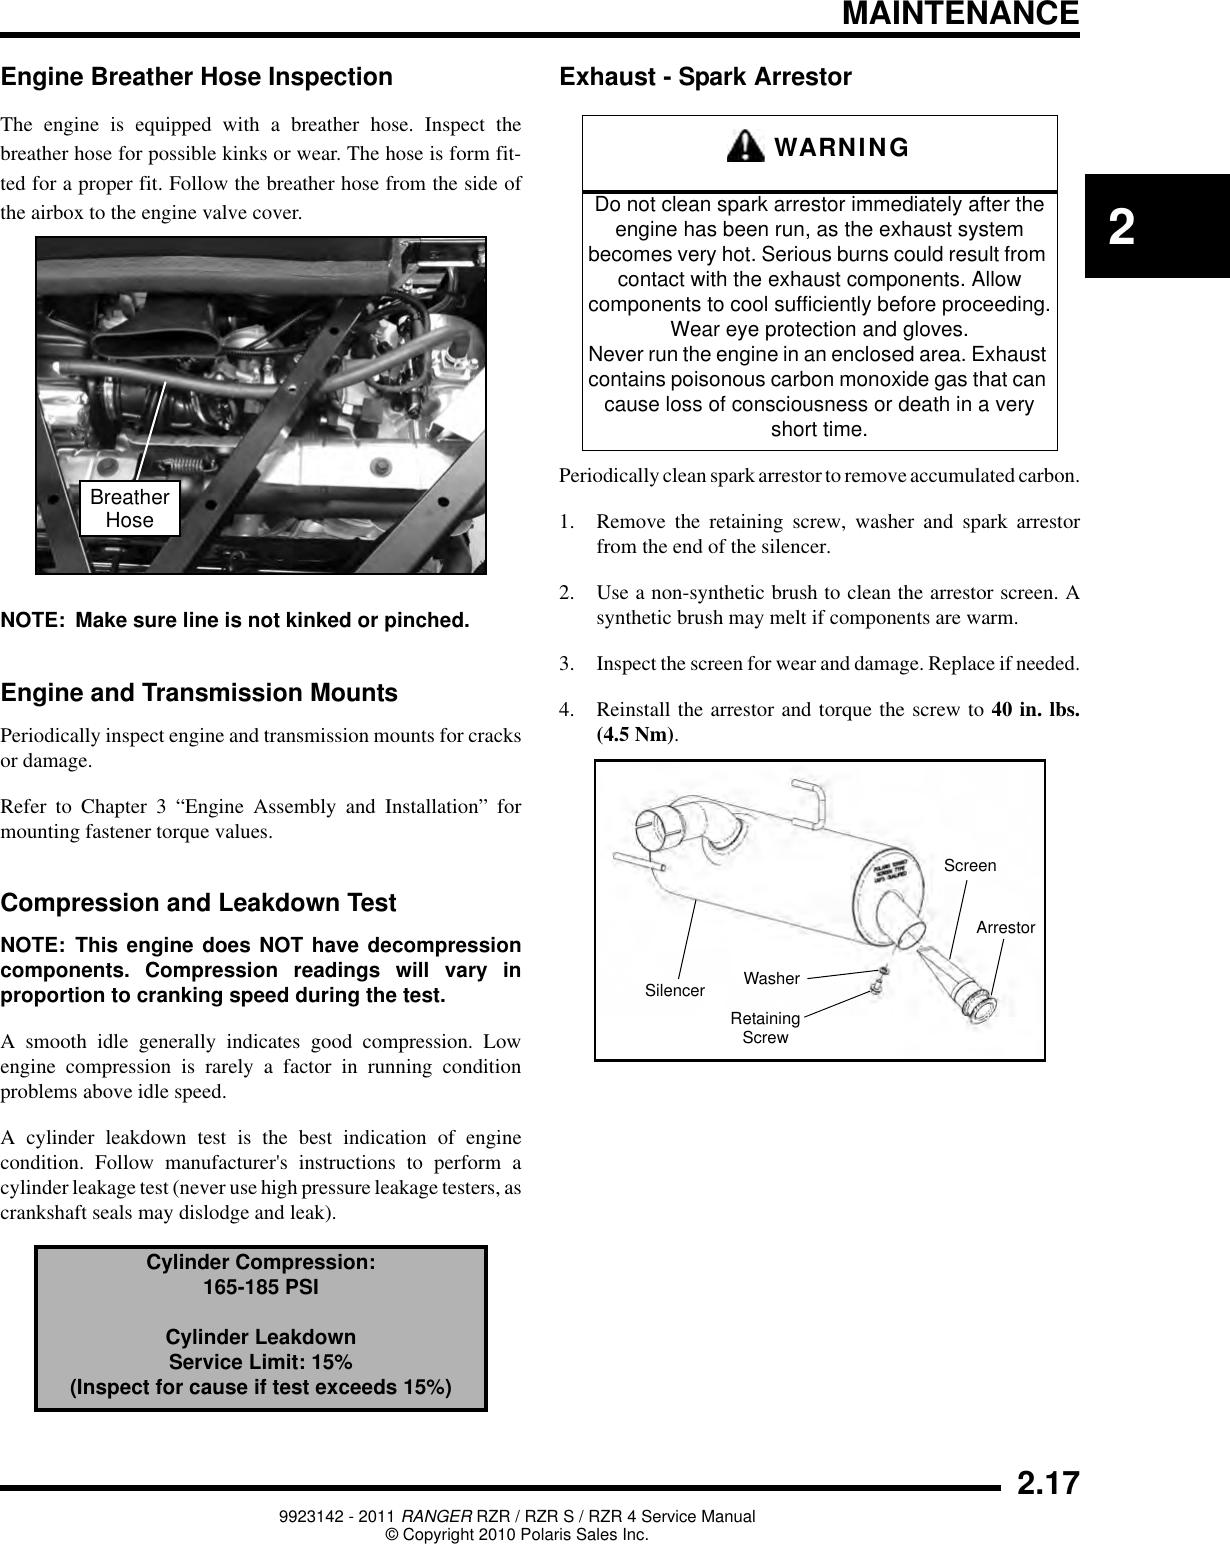 Polaris Rzr Users Manual 9923142_RZR_800